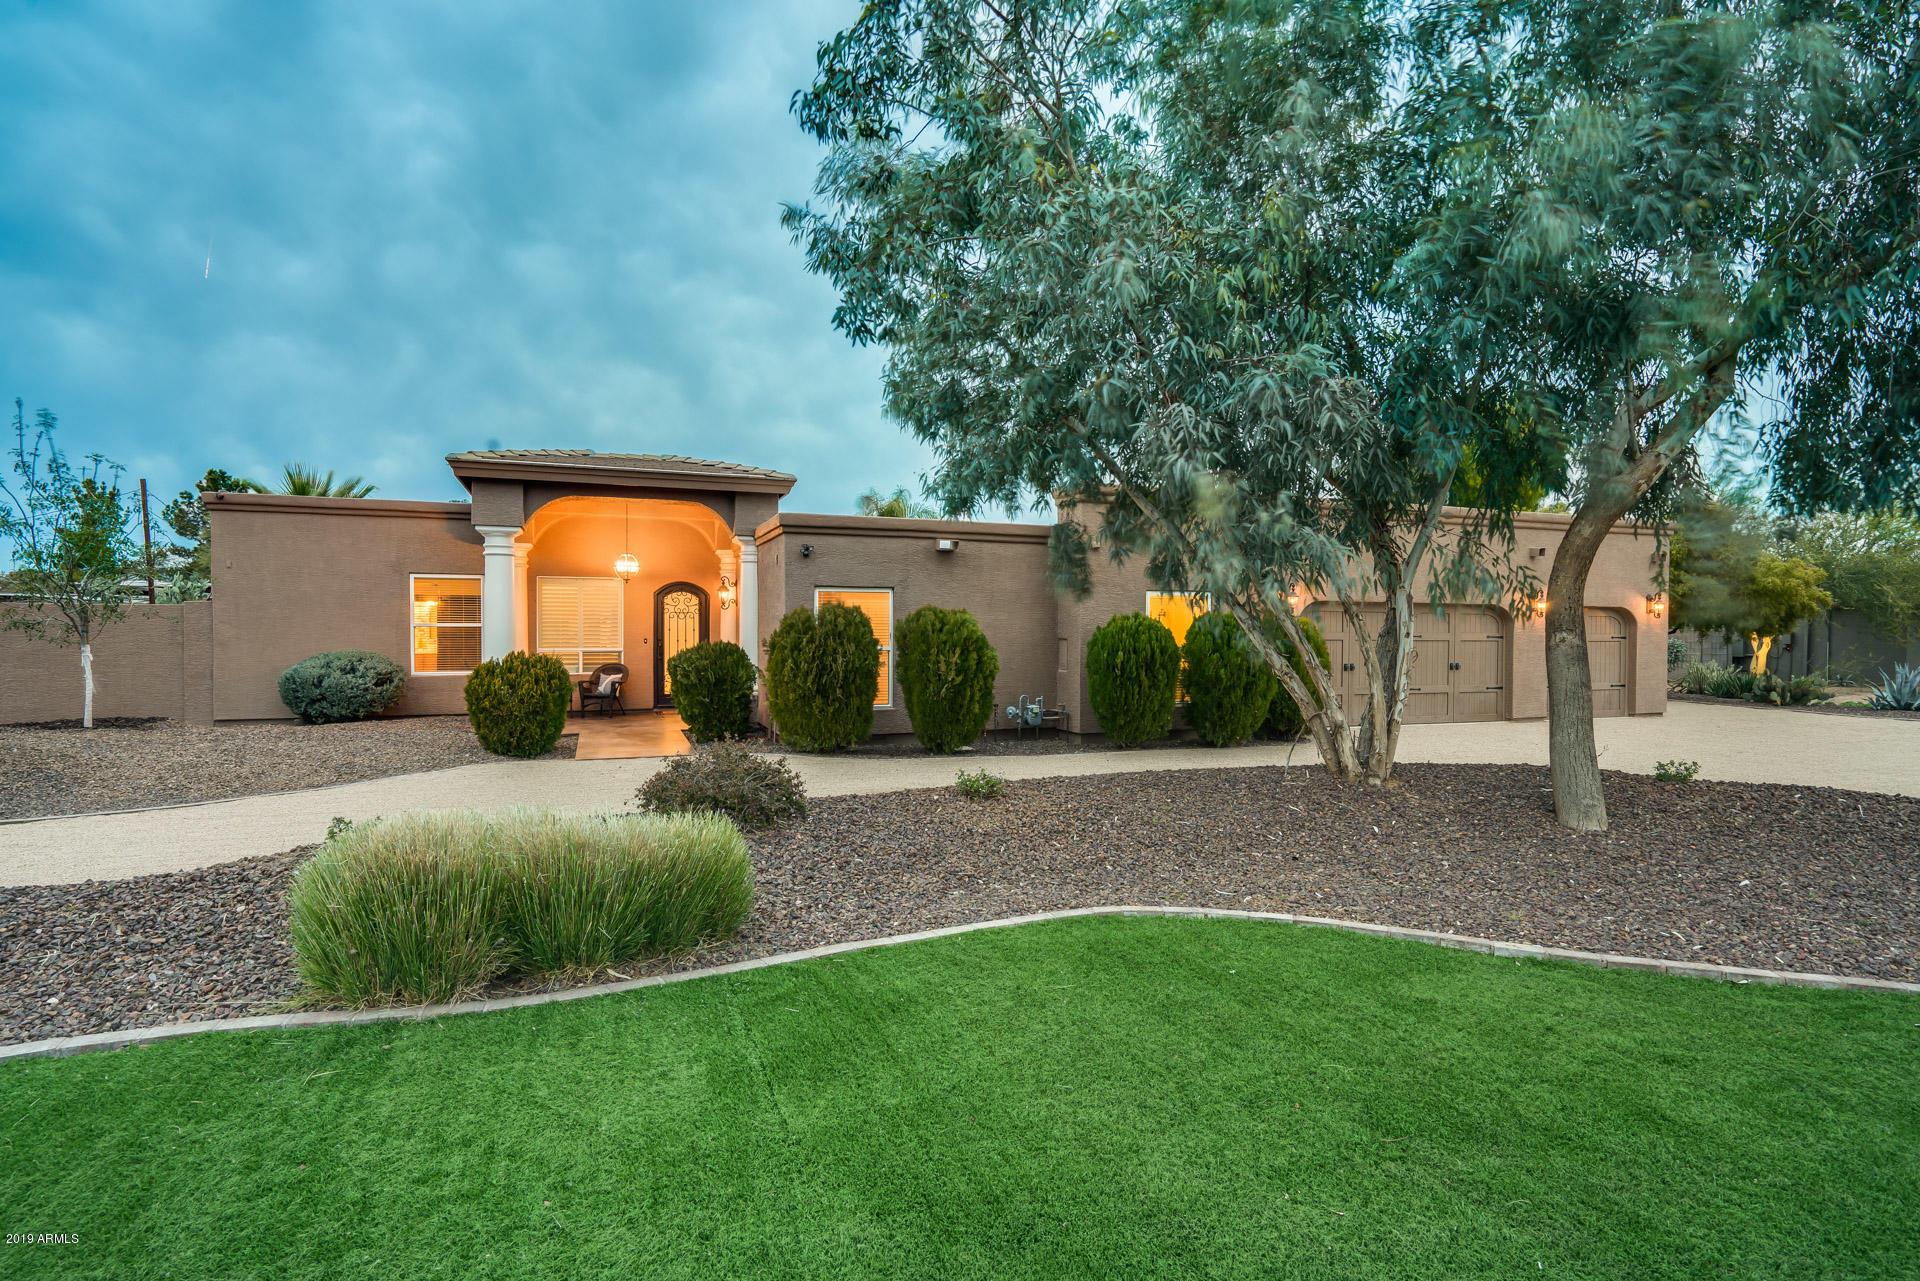 6620 E CHOLLA Street, Scottsdale AZ 85254